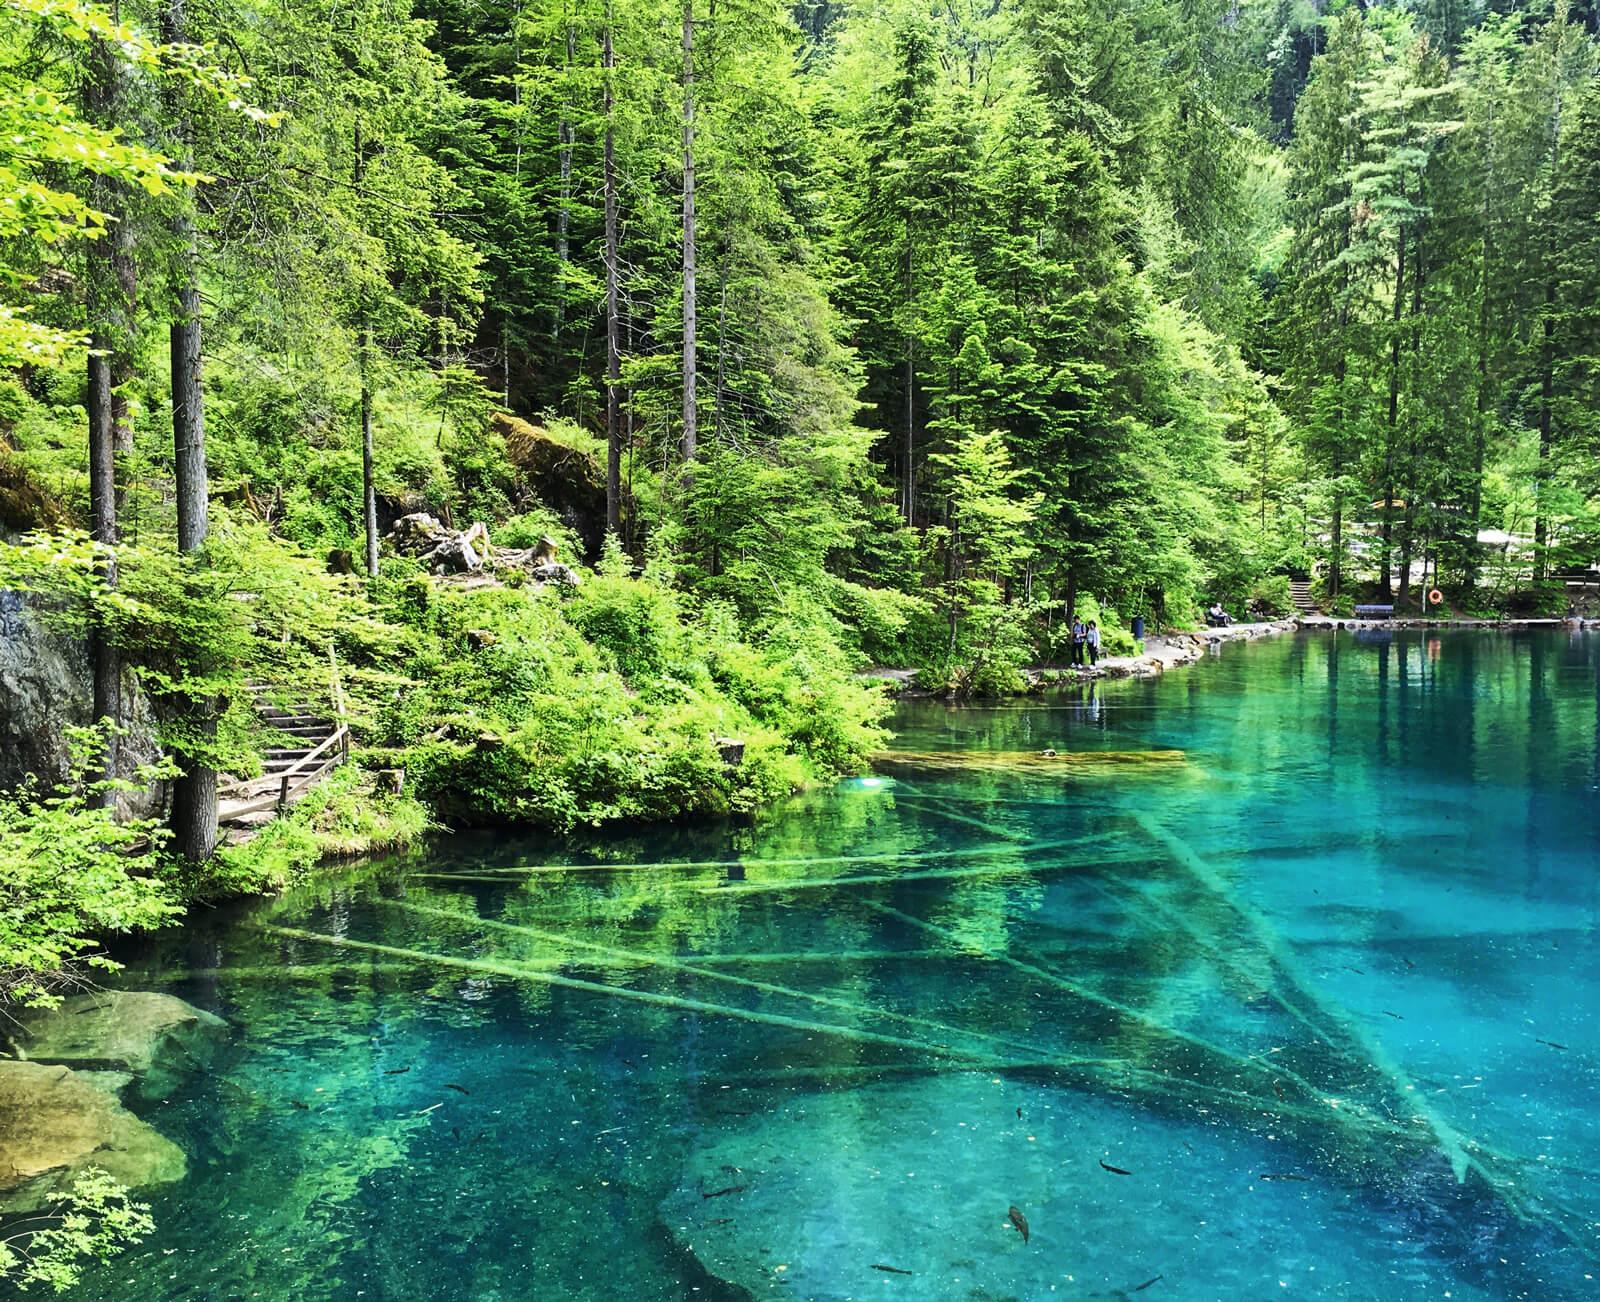 Lake Blausee in Switzerland during summer